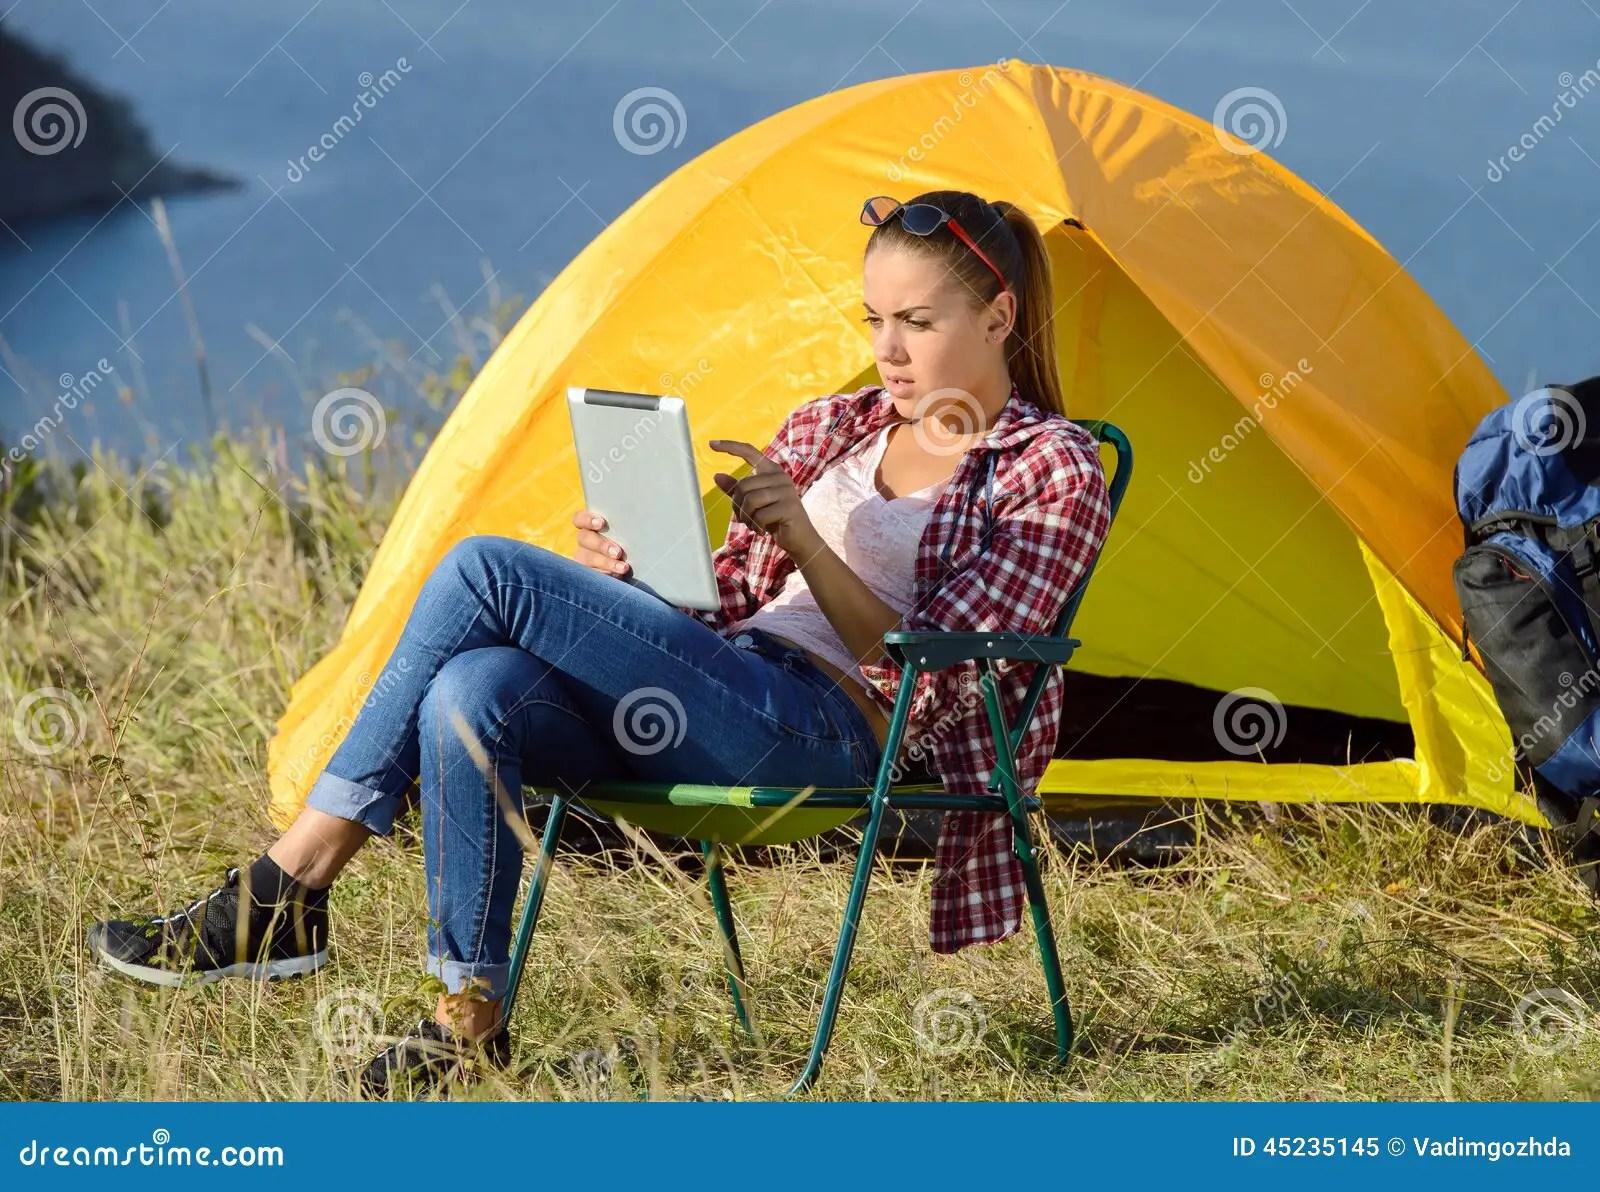 Camping Stock Photo  Image 45235145